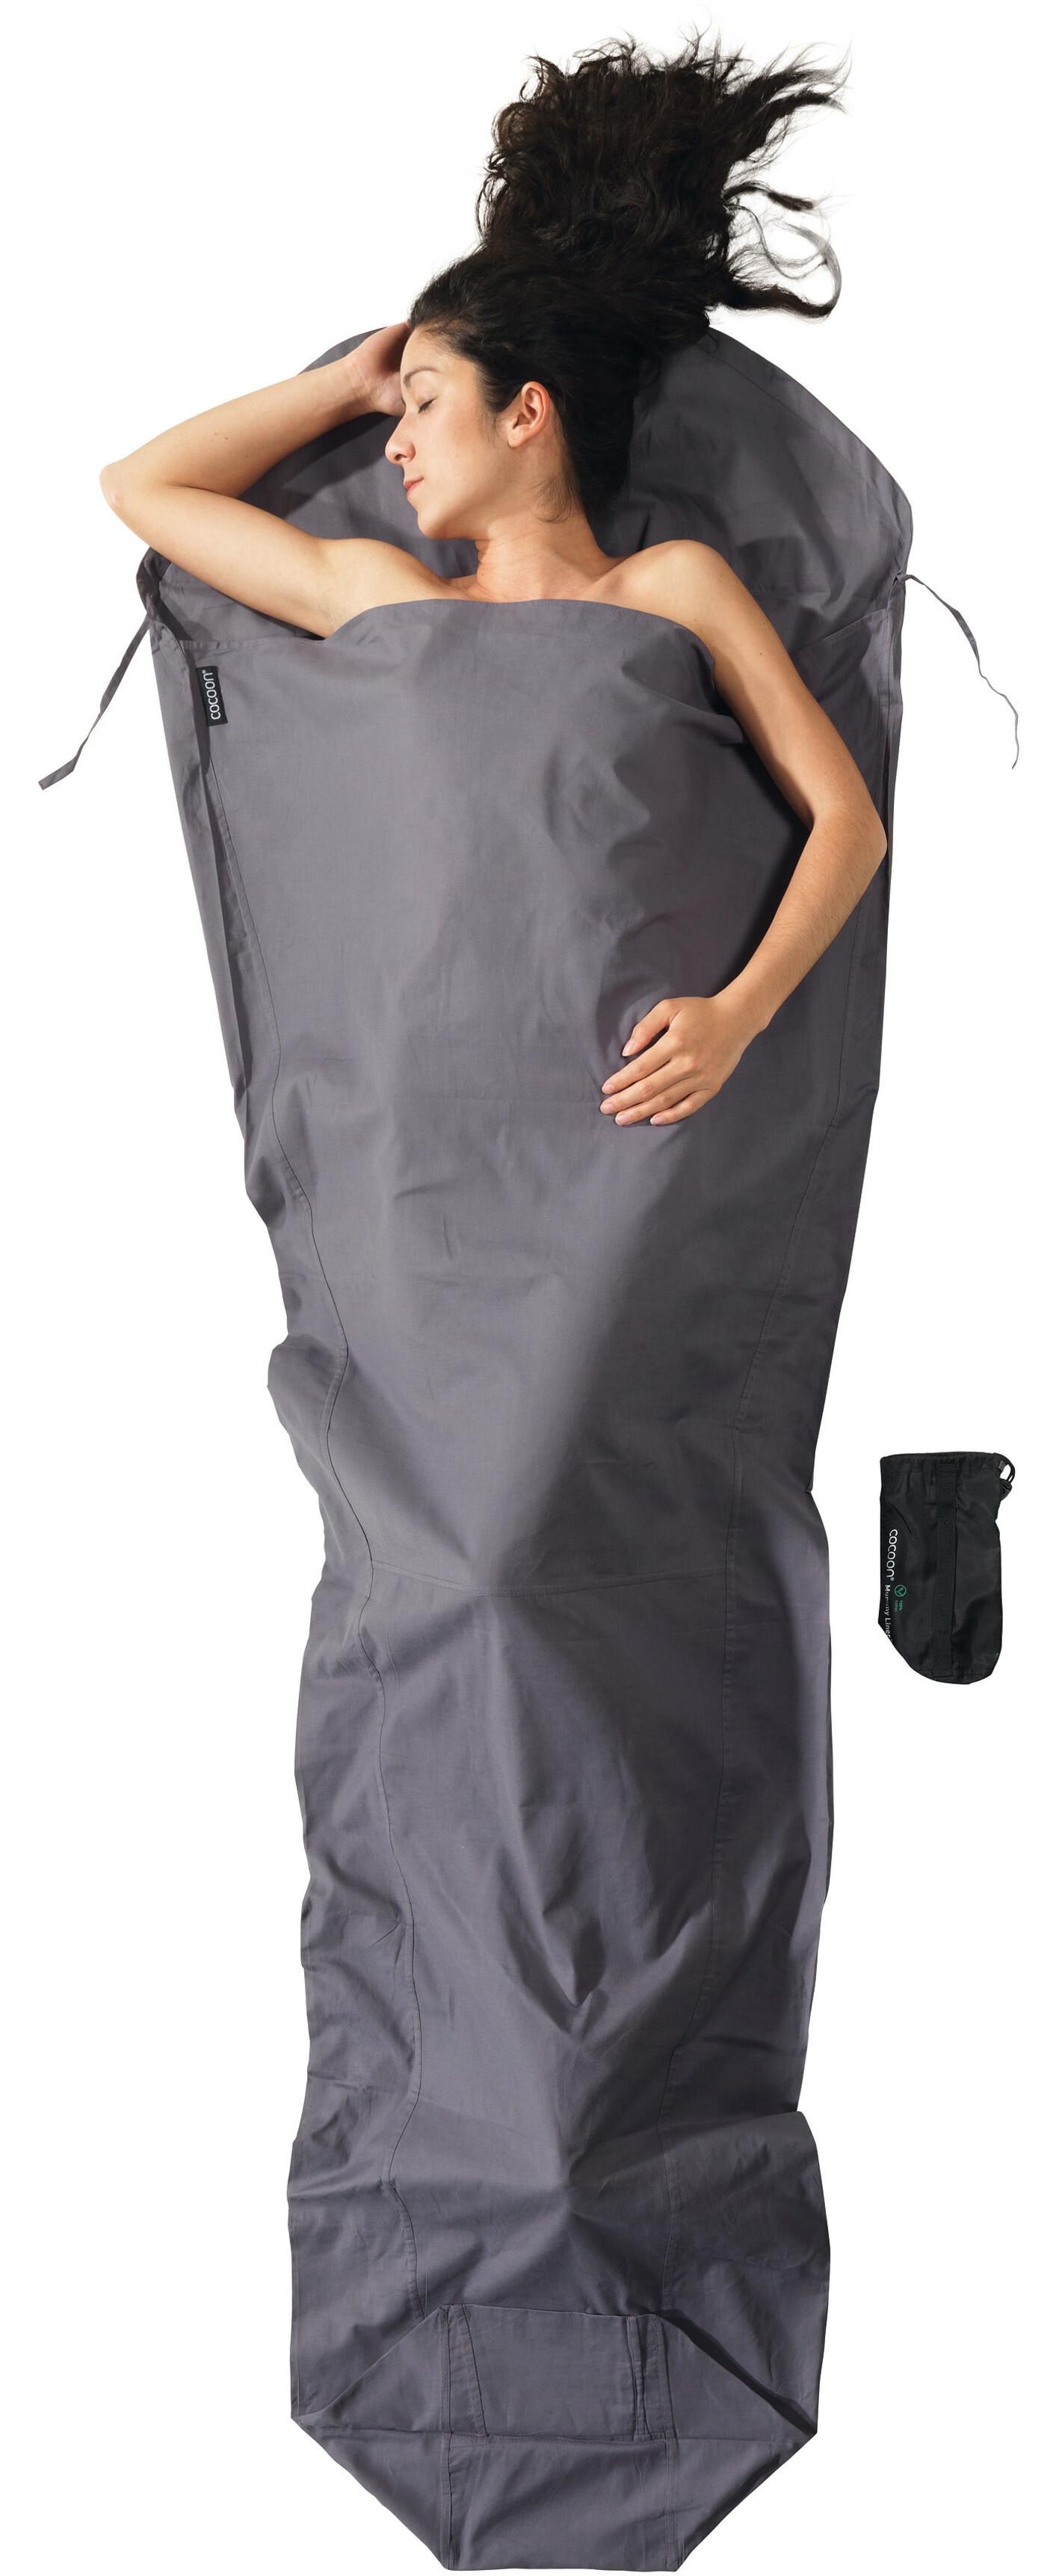 cocoon drap sac de couchage en coton gris boutique de v los en ligne. Black Bedroom Furniture Sets. Home Design Ideas